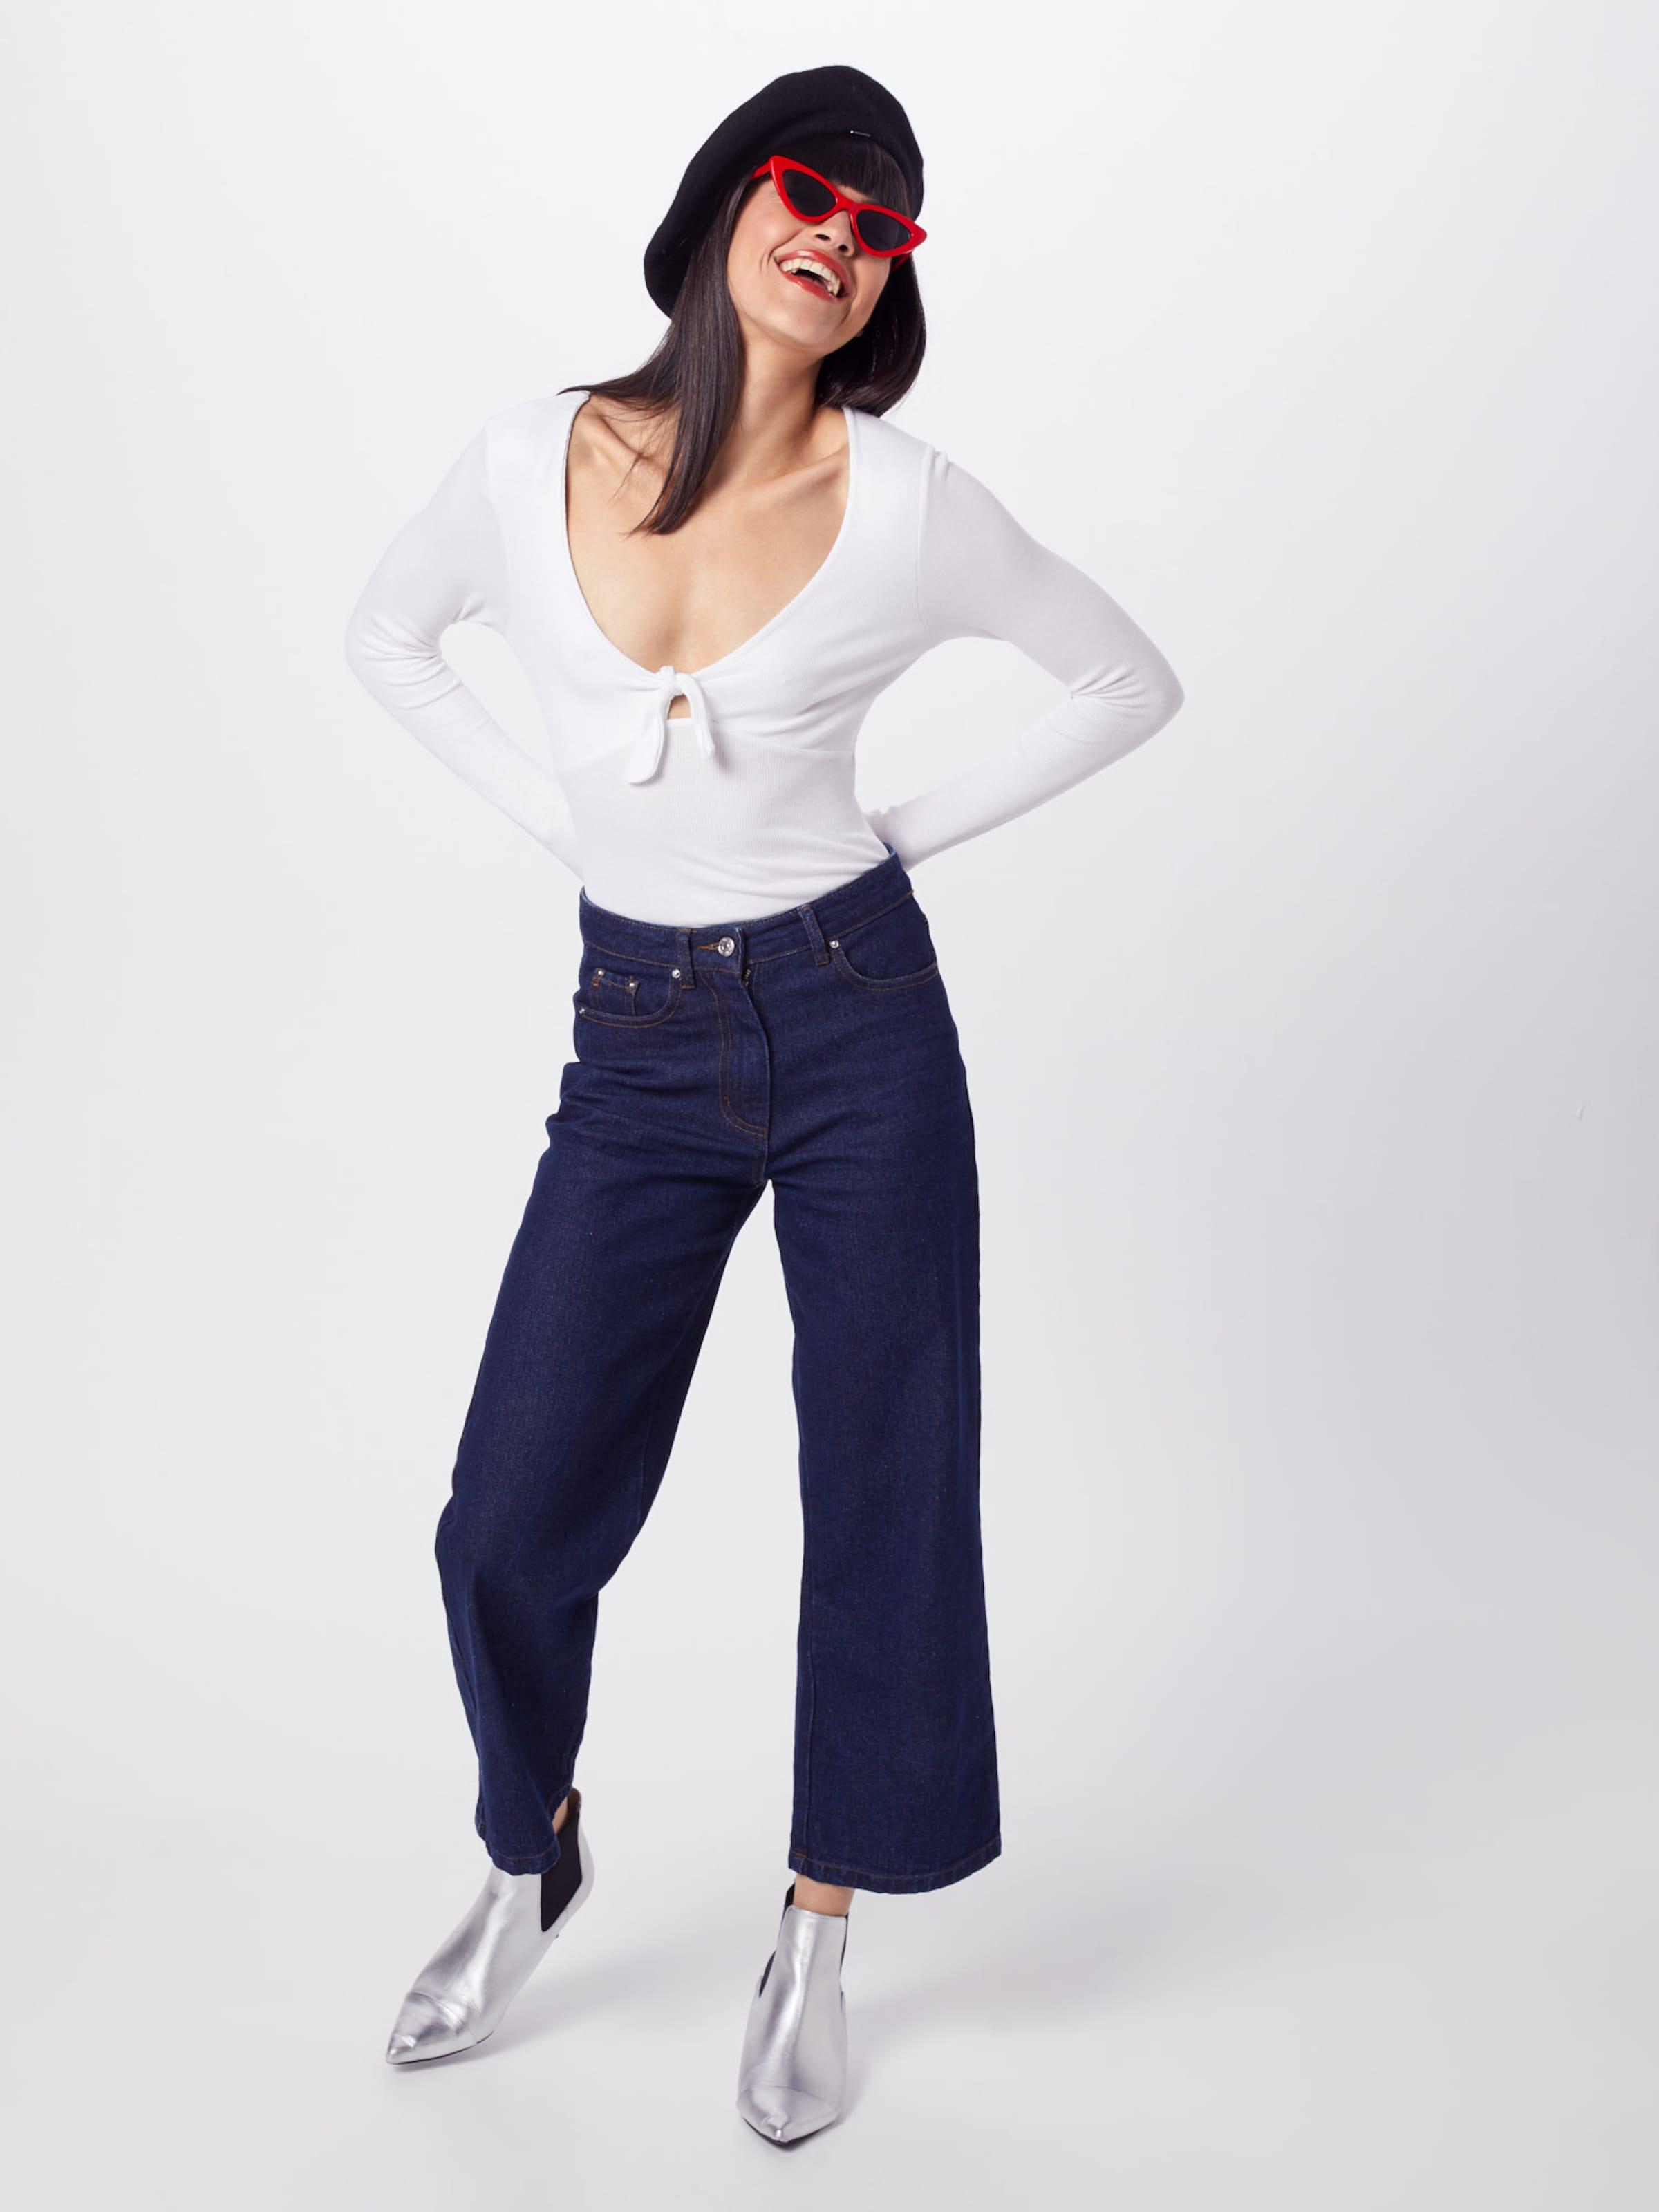 'ribbed Bodysuit' Blanc En Missguided T shirt Front Tie PZiXuk